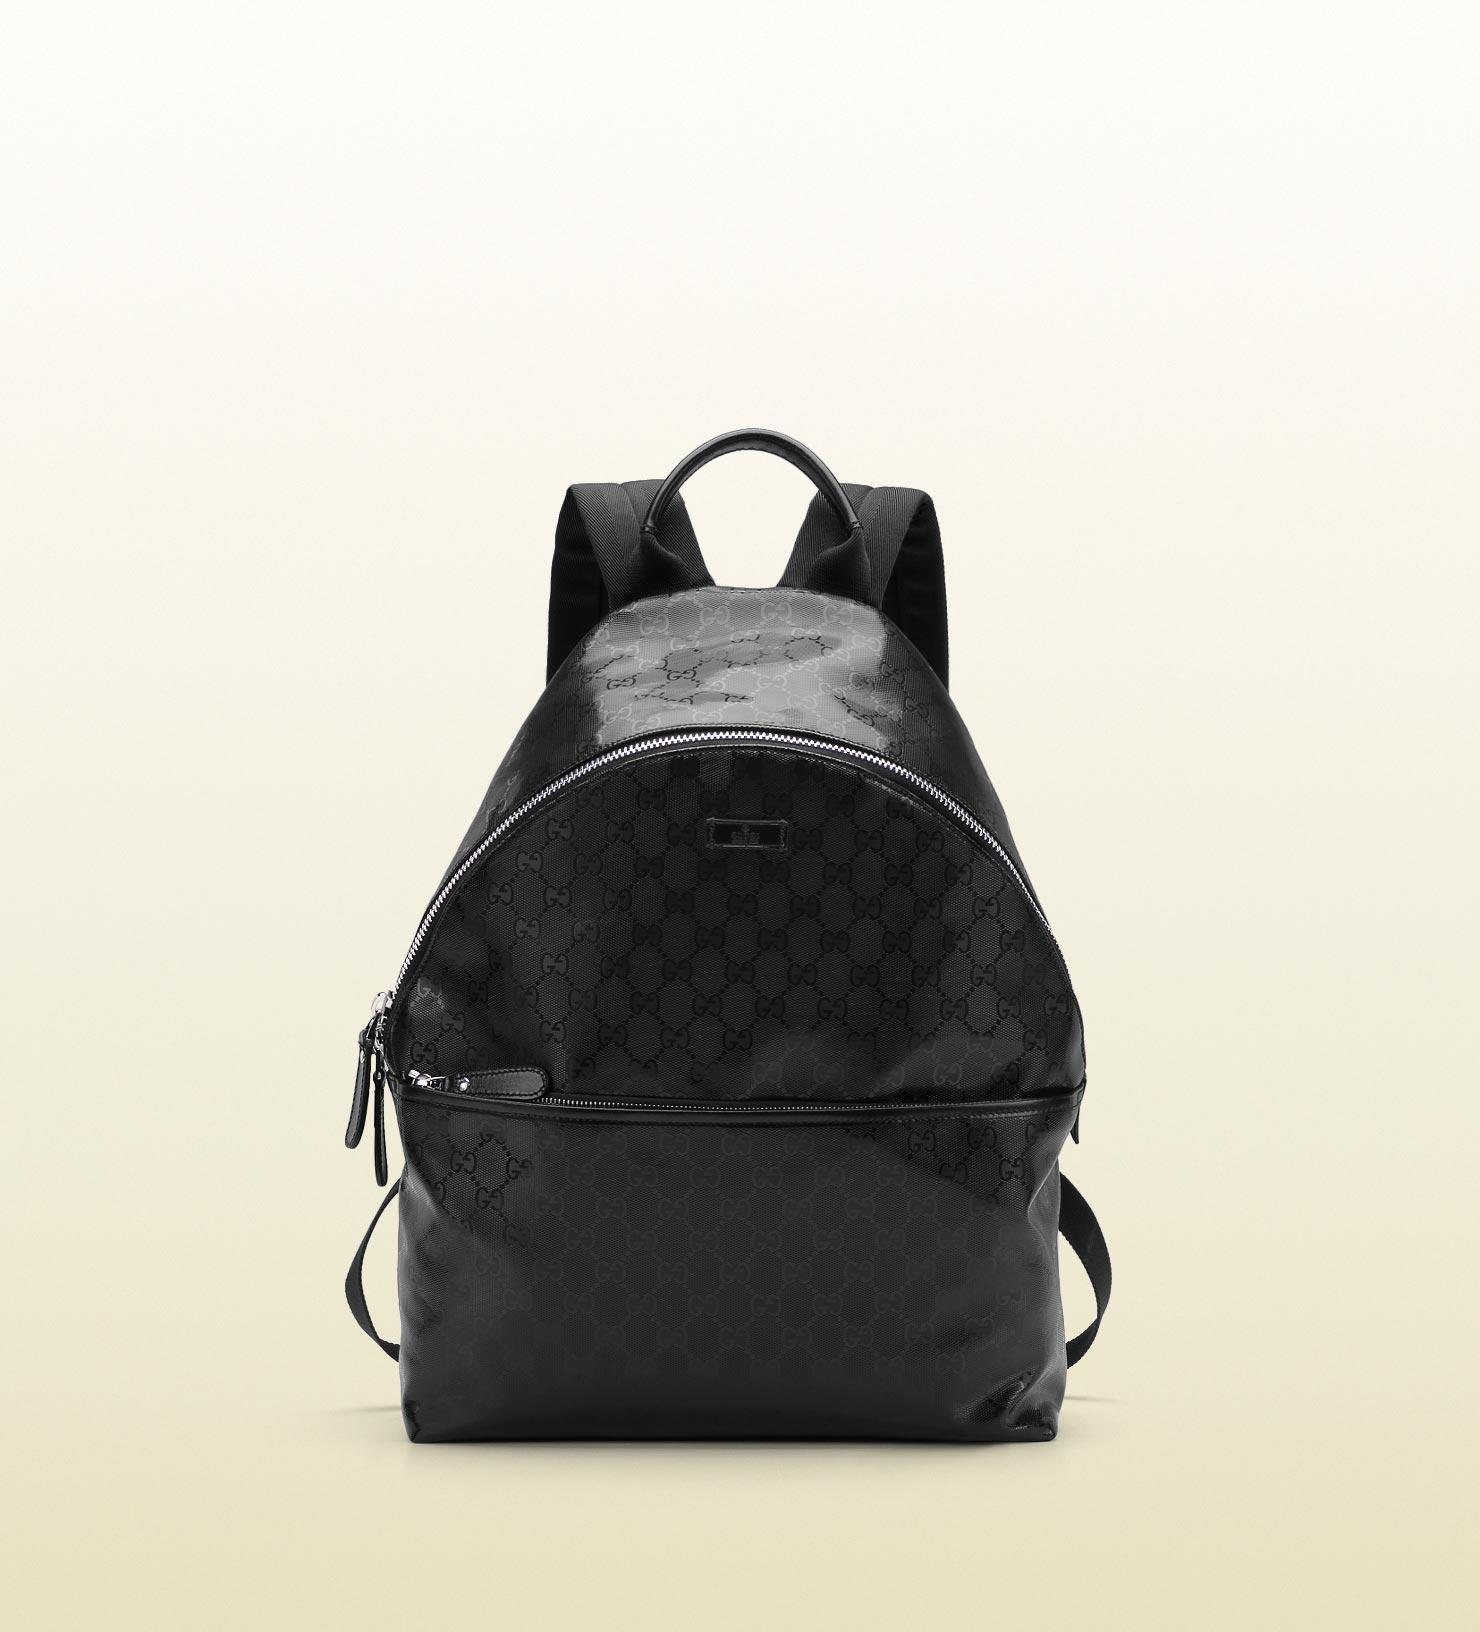 1e6221ee1b3f Lyst - Gucci Gg Imprime Zip Backpack in Black for Men